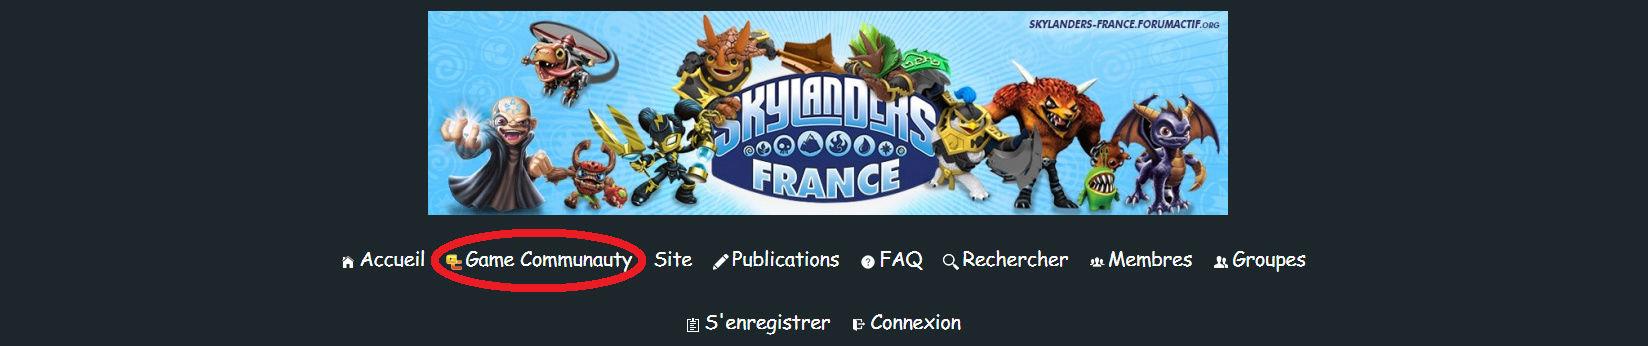 [SITE] La fin du forum Skylanders France approche Sans_t10